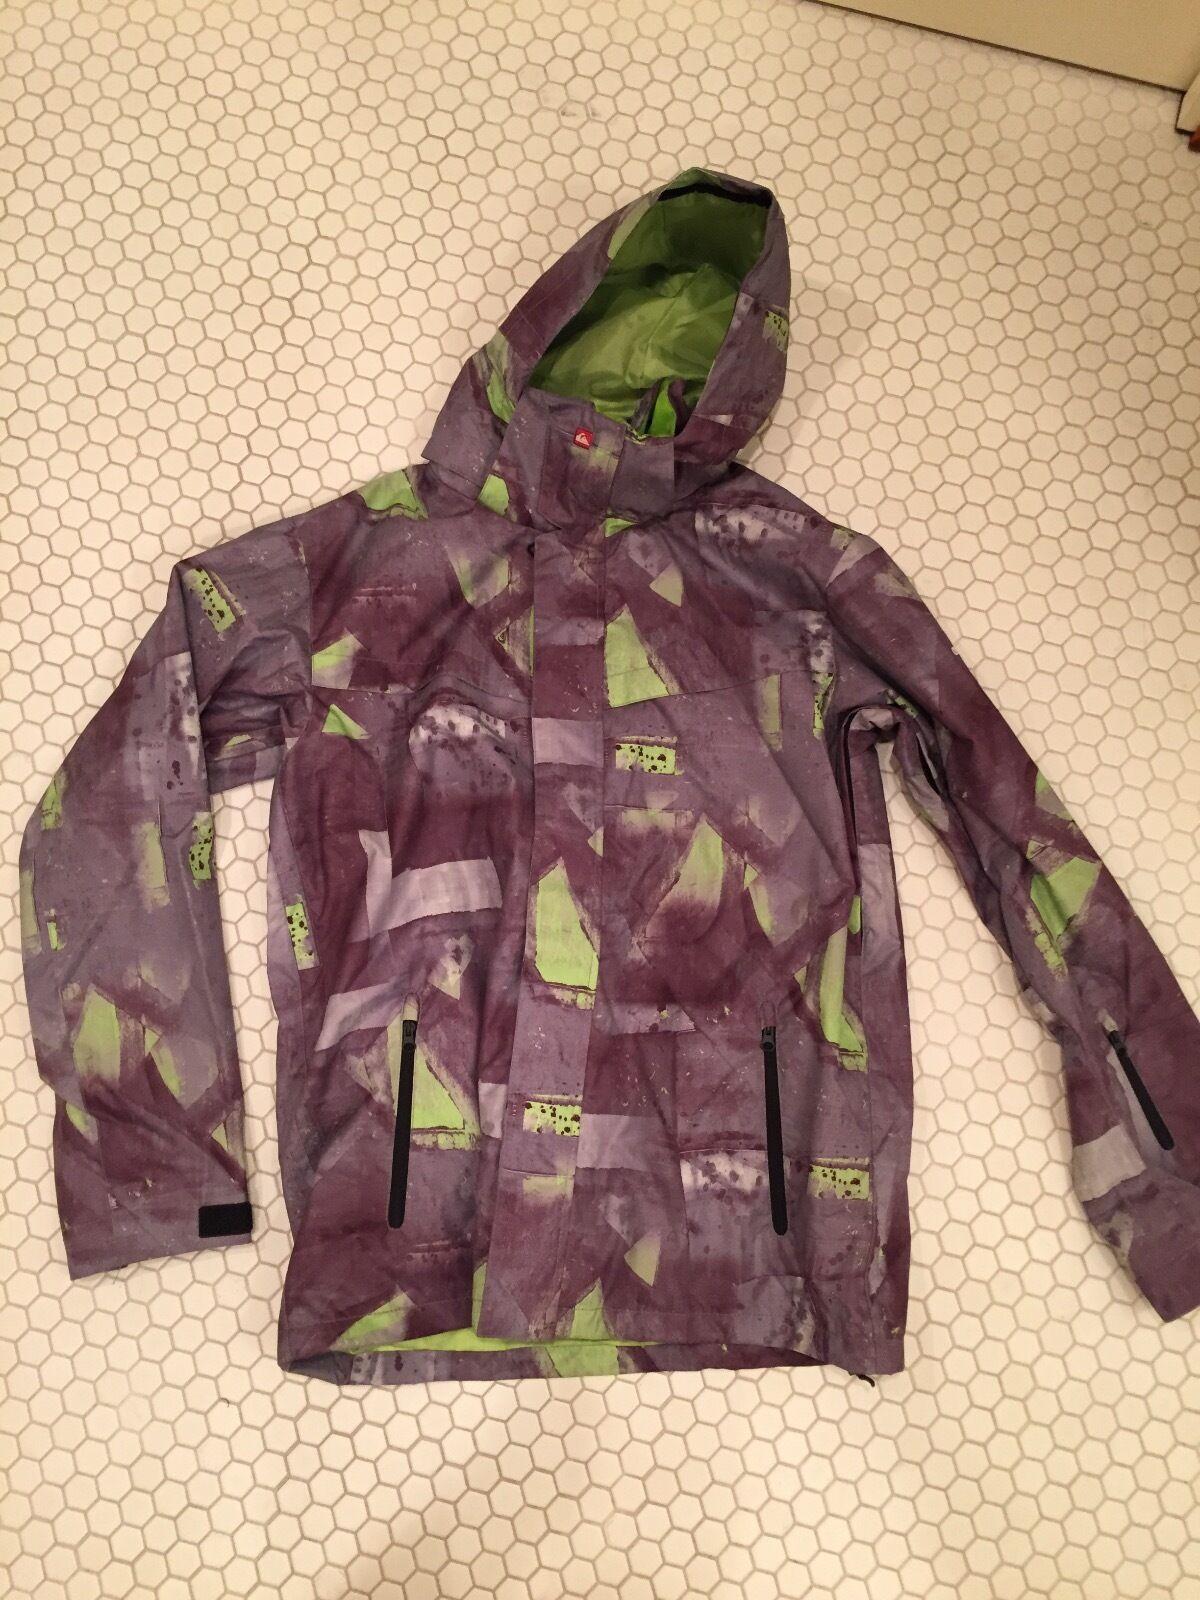 QuikSilber Sie Snowboard Jacket Outerwear Jacket Camo - Größe M - Removable Hood